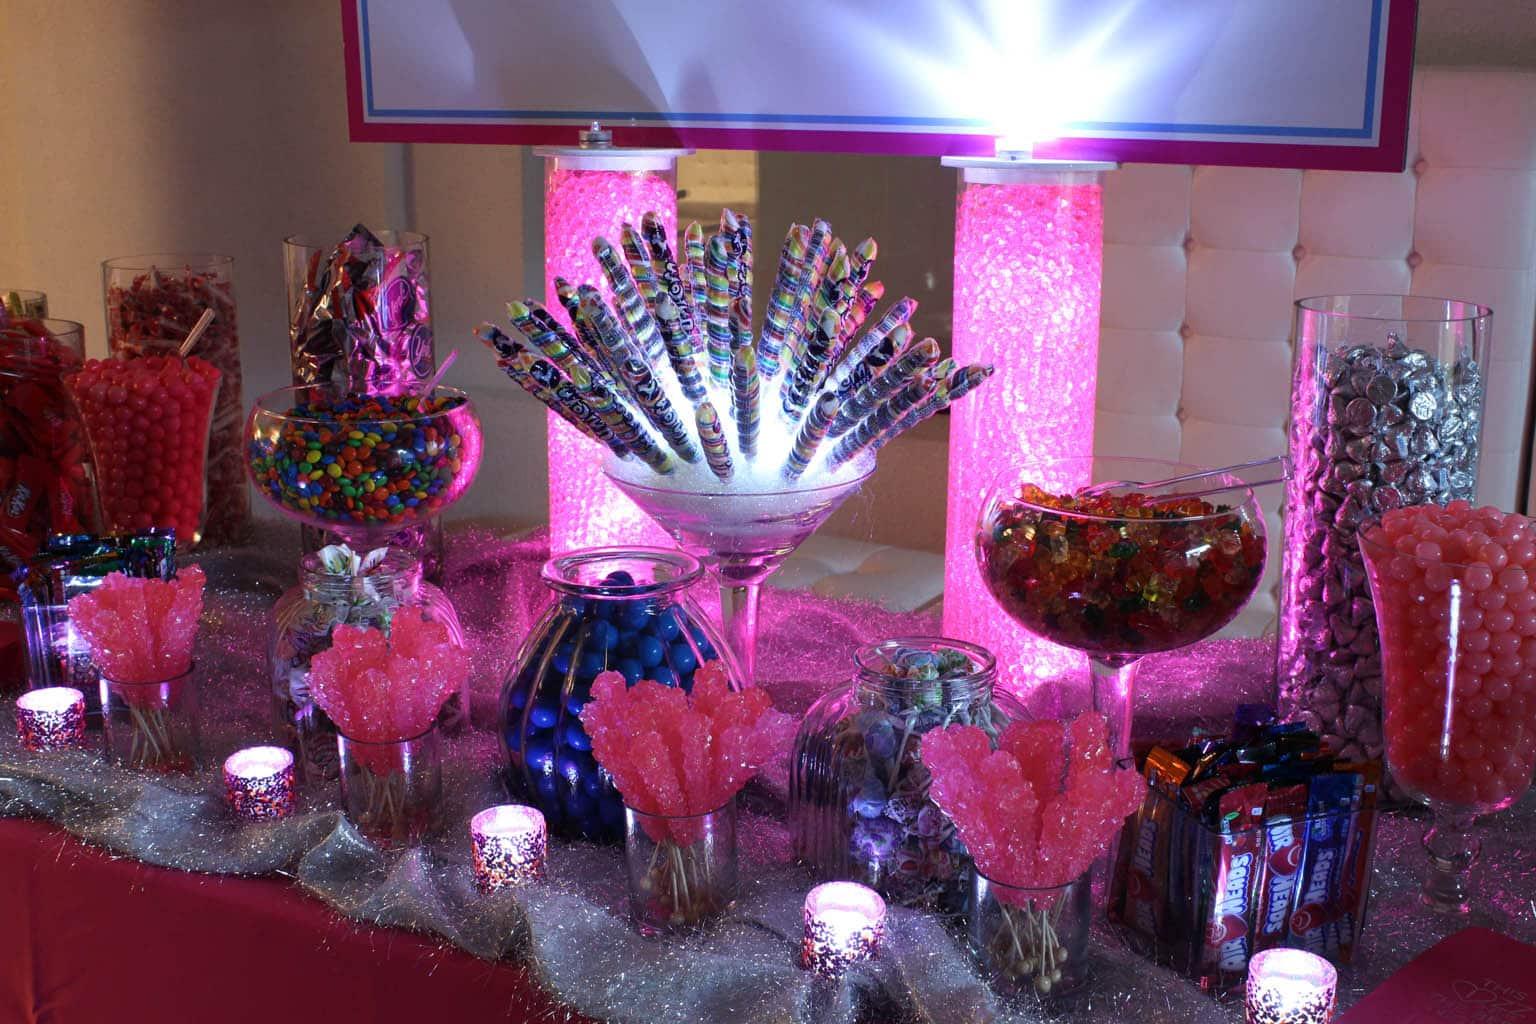 Candy bars balloon artistry